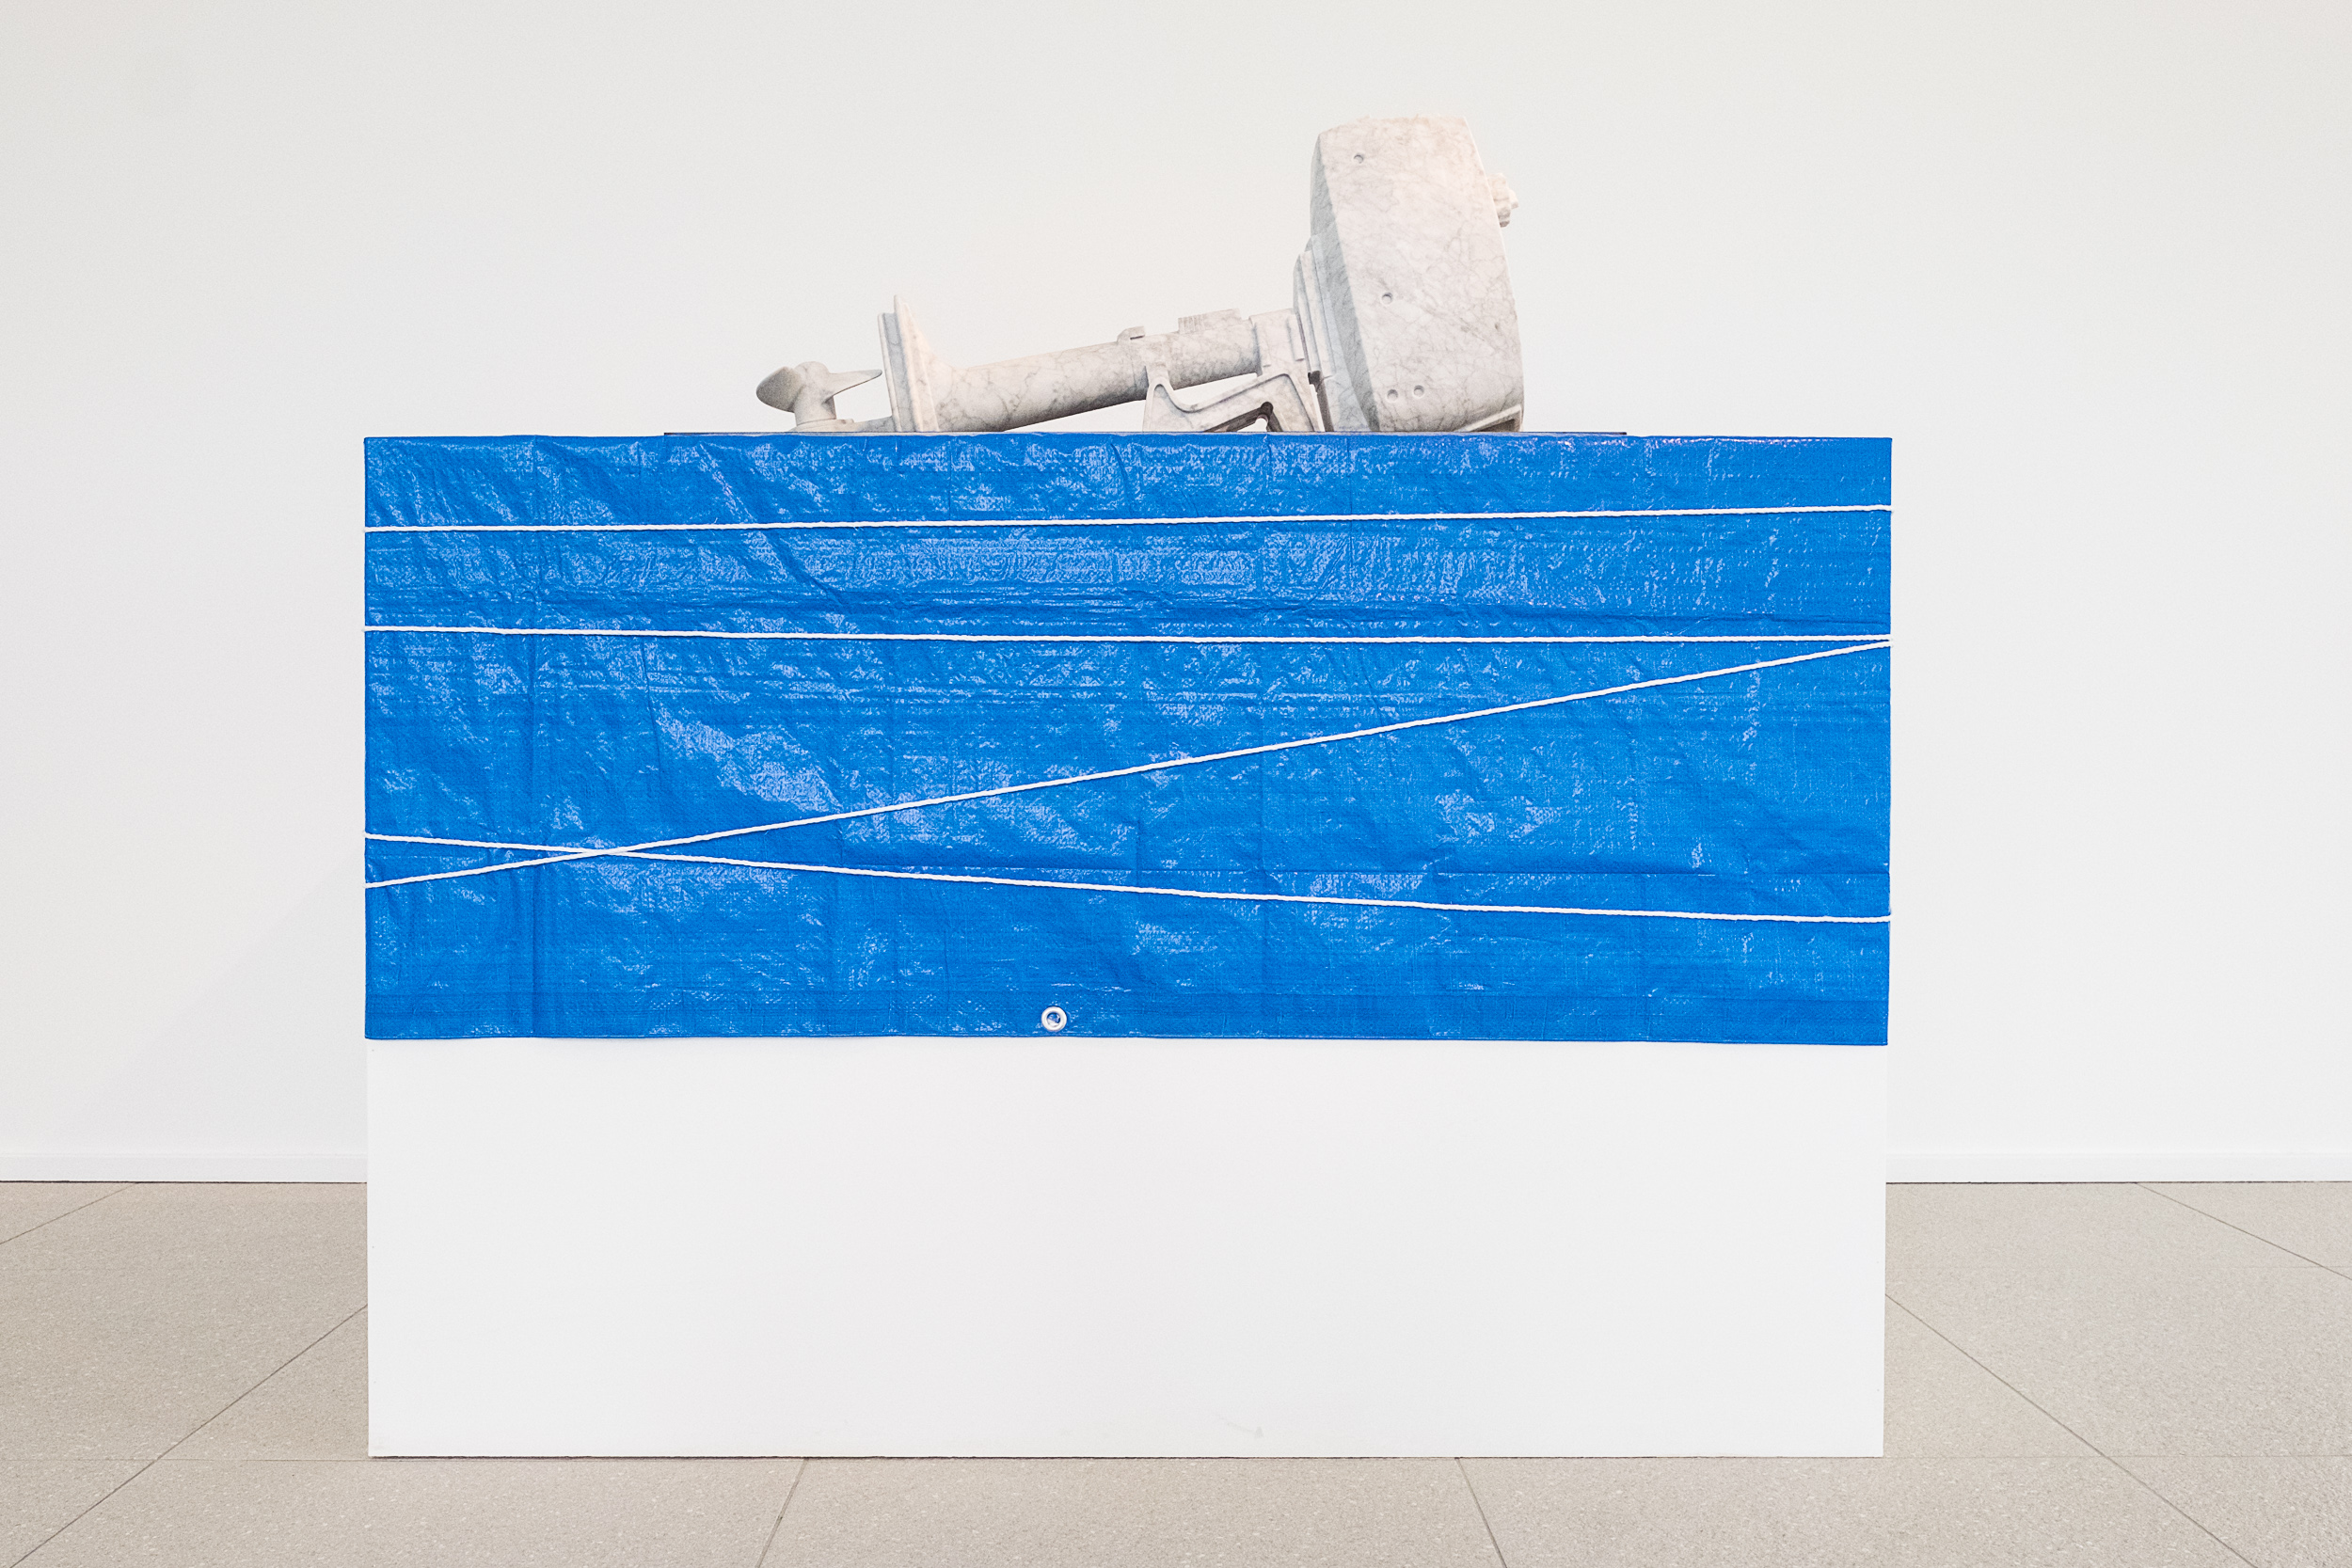 Oilstone 01: Transparent     2015 Bianco carrara, stainless steel, motor oil, plinth, tarp, rope 100 x 38 x 42 cm